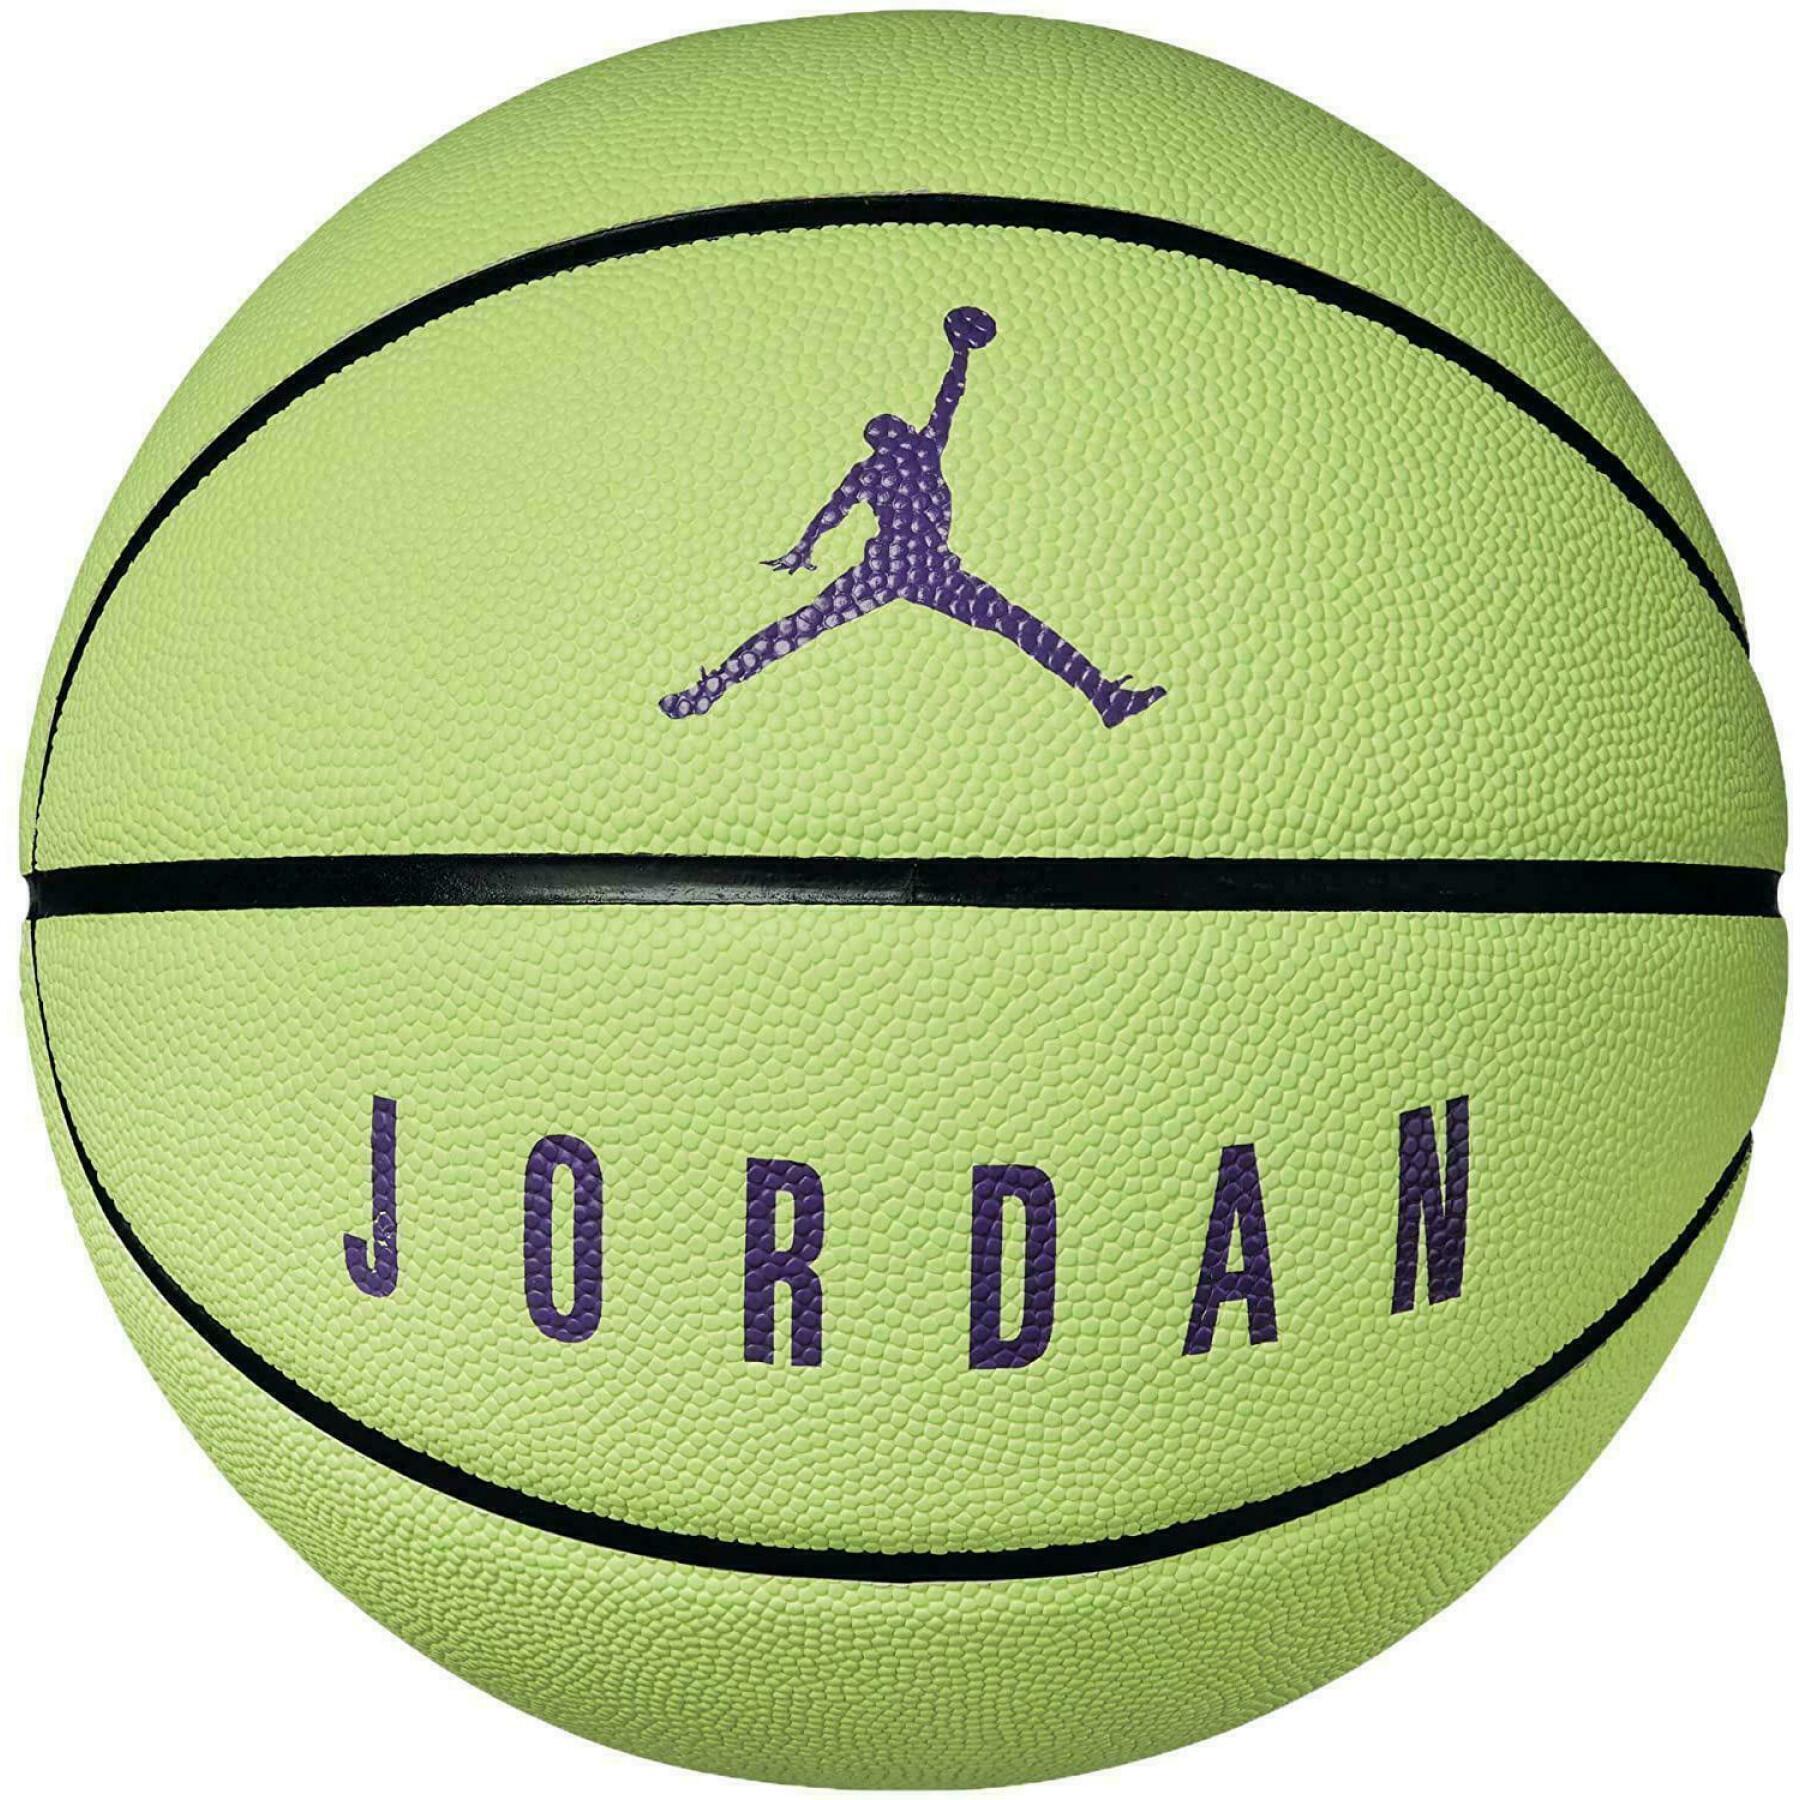 jordan ultimate 8p ball